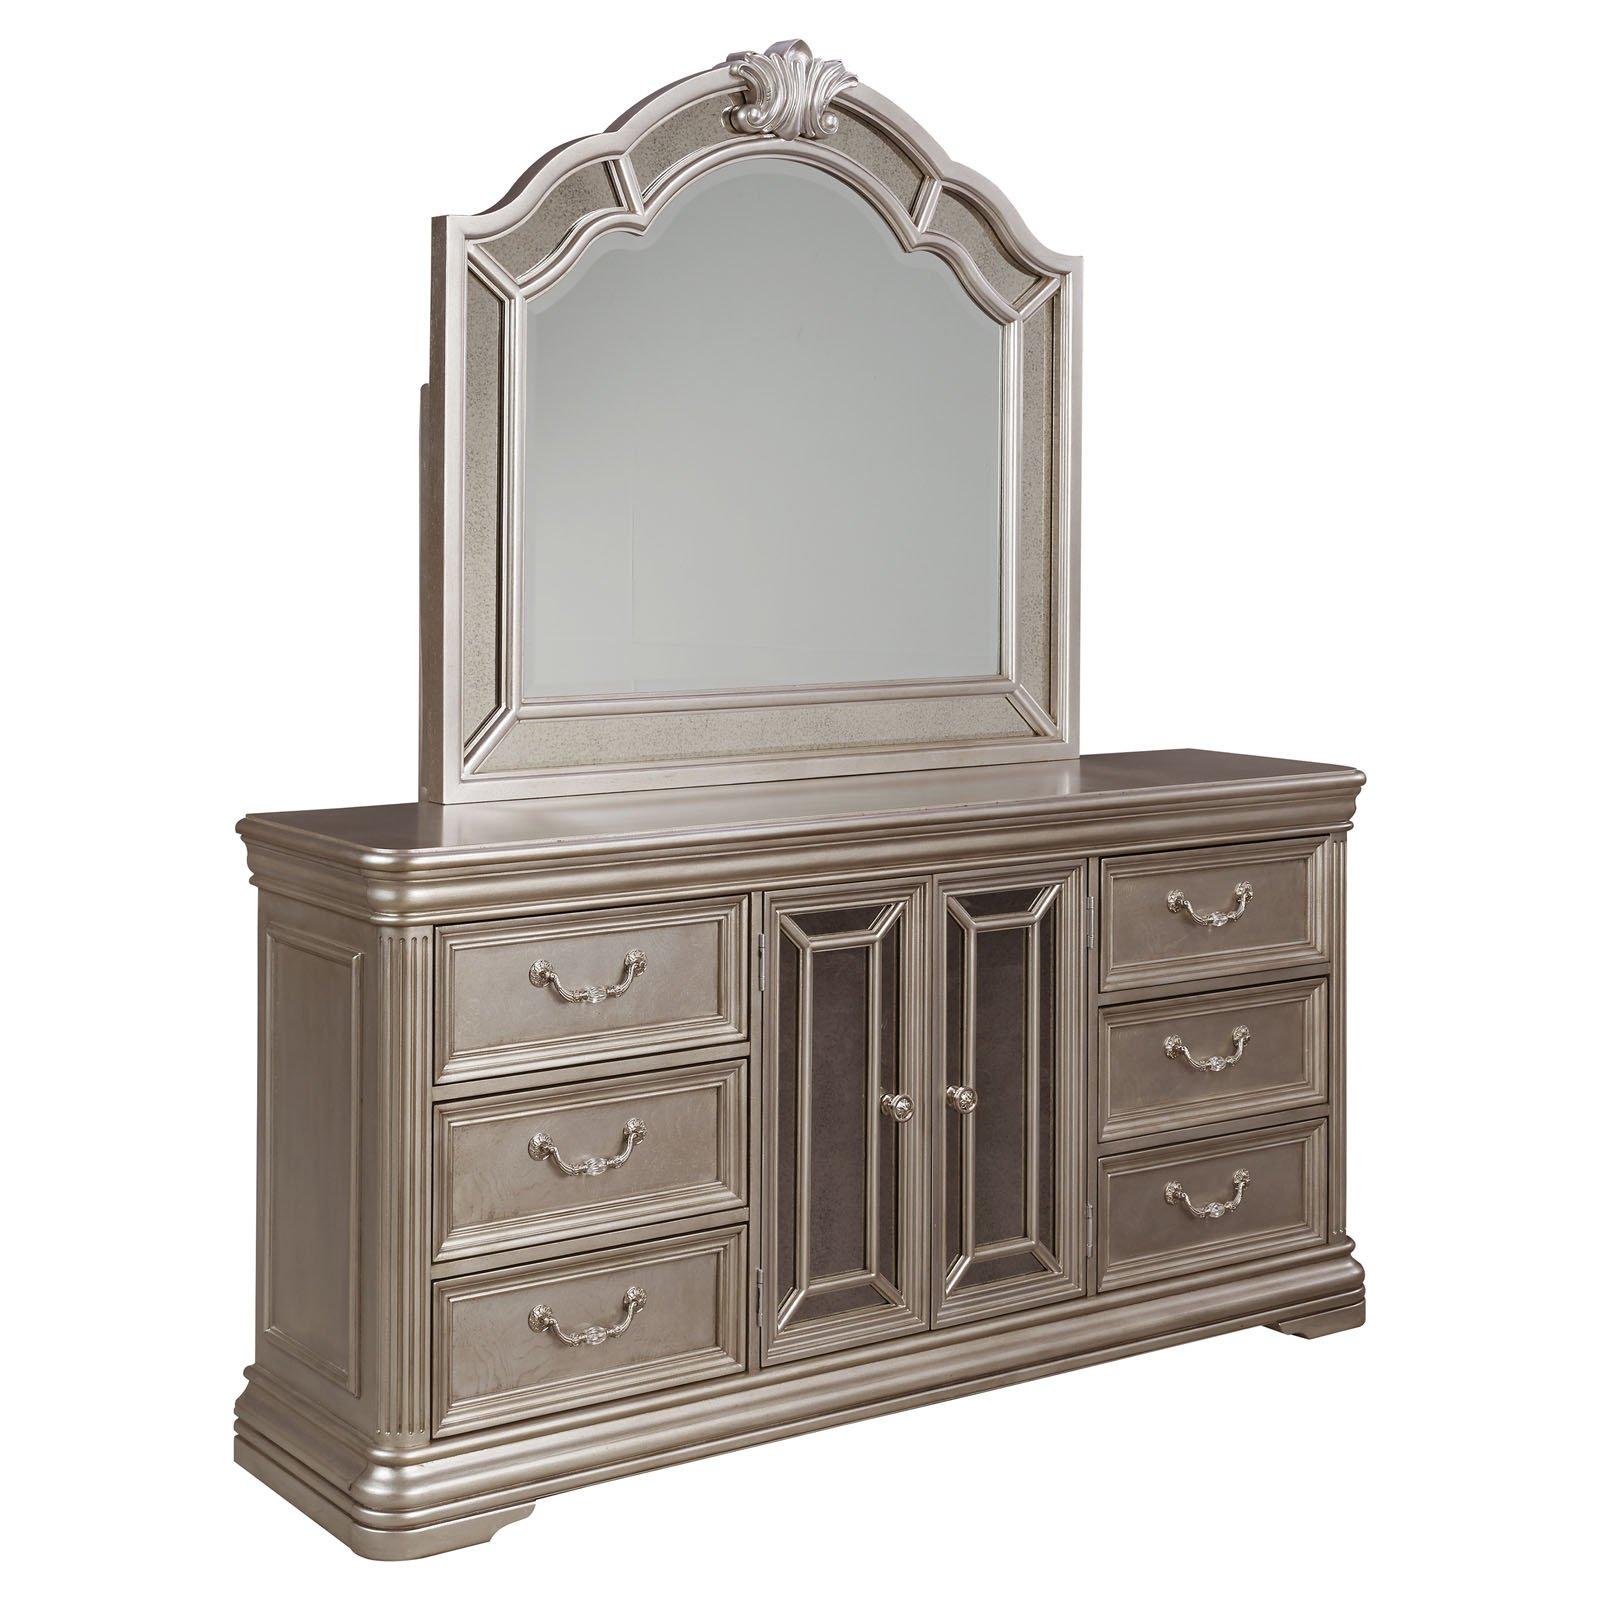 Signature Design by Ashley Birlanny 6 Drawer Dresser with Optional Mirror